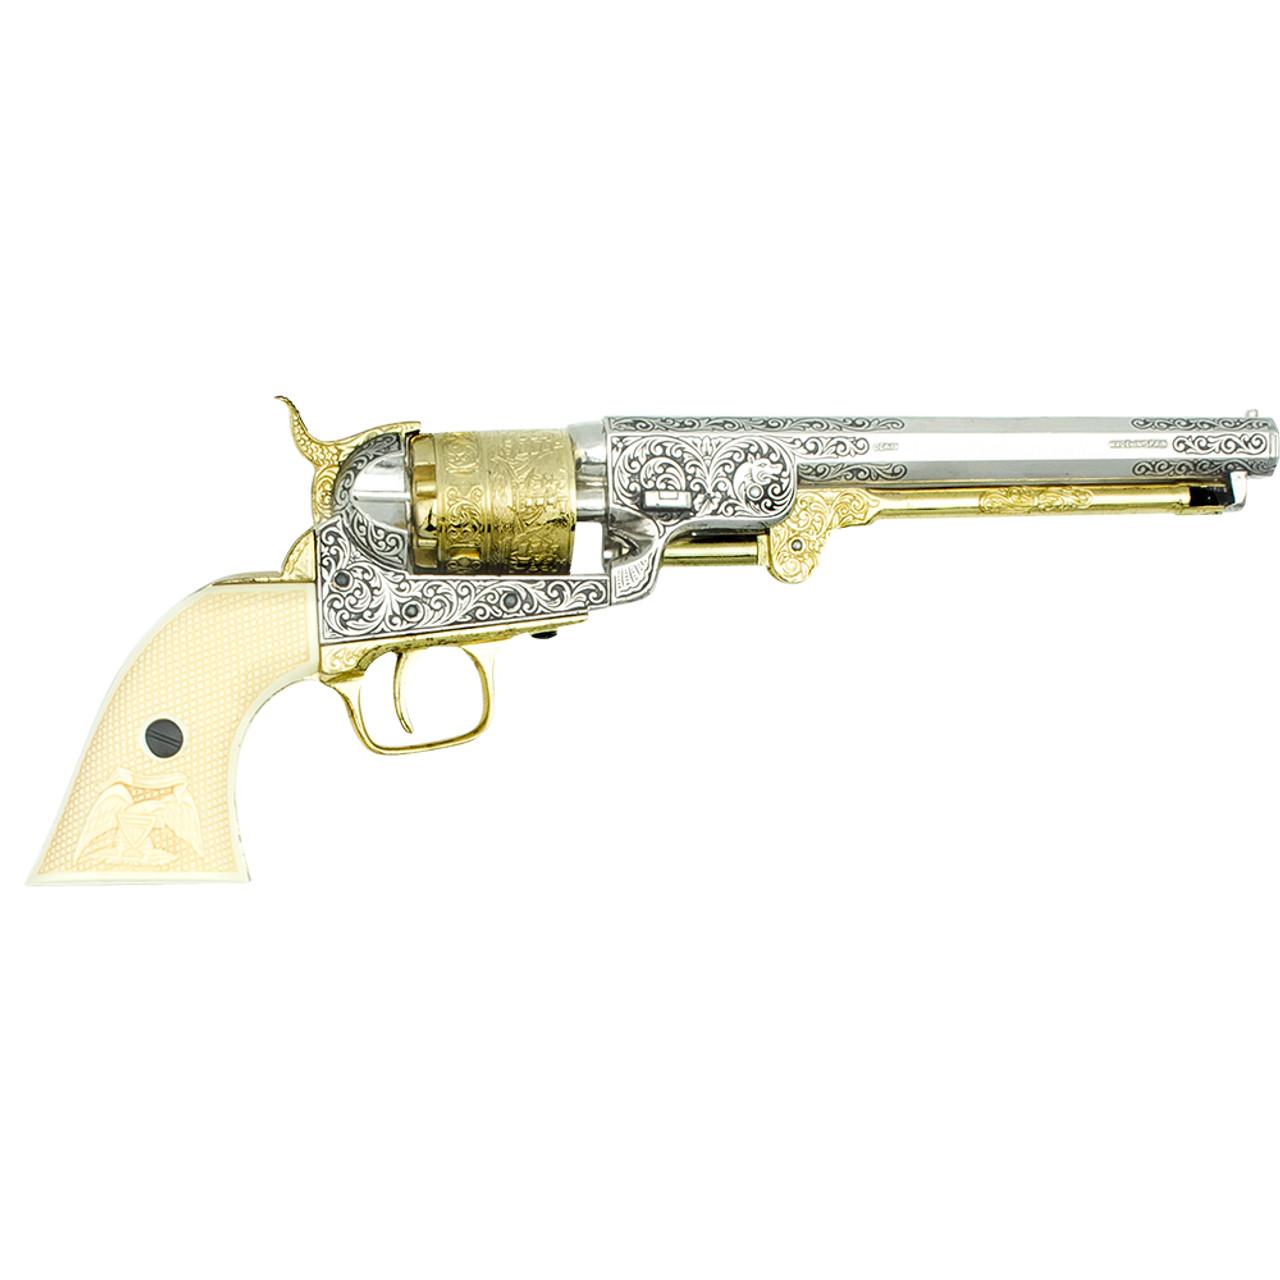 Nickel Denix CA Classic M1851 Navy Revolver